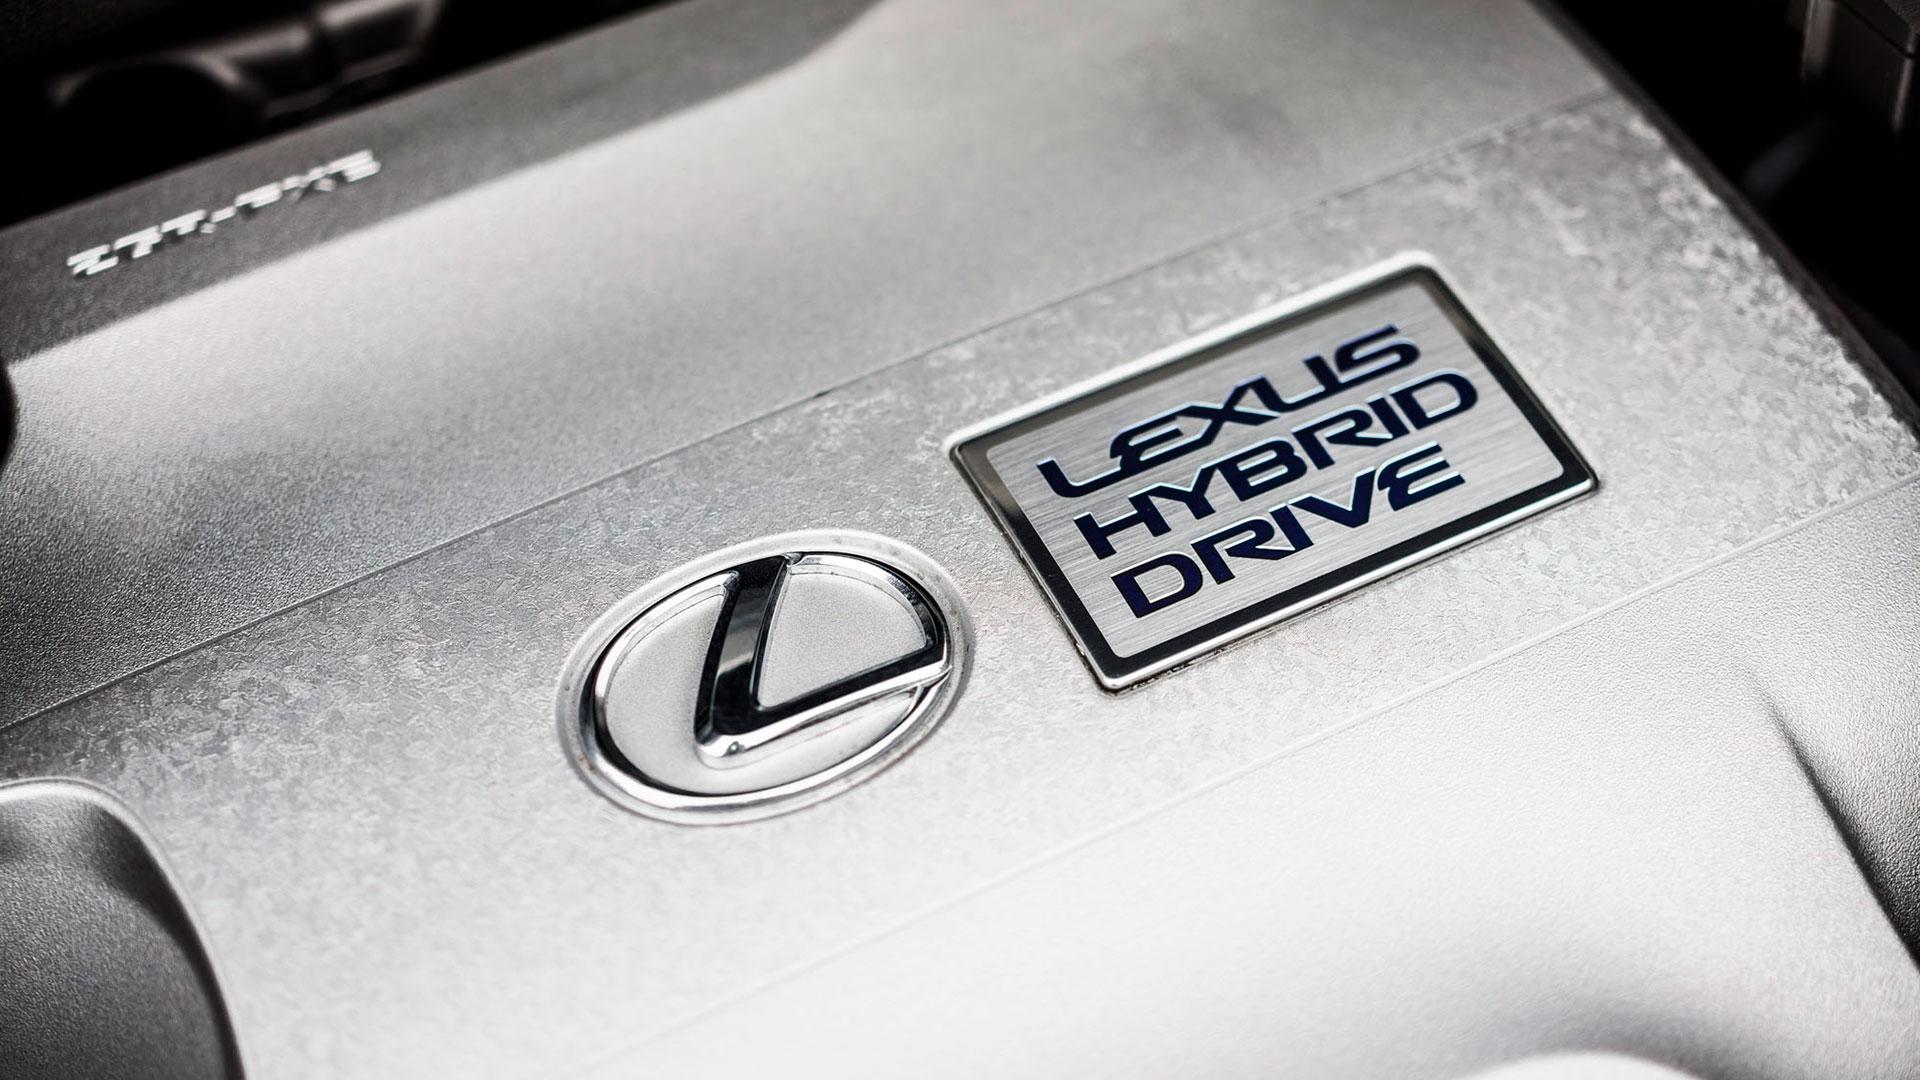 Lexus Hybrid Drive más fiable para la OCU